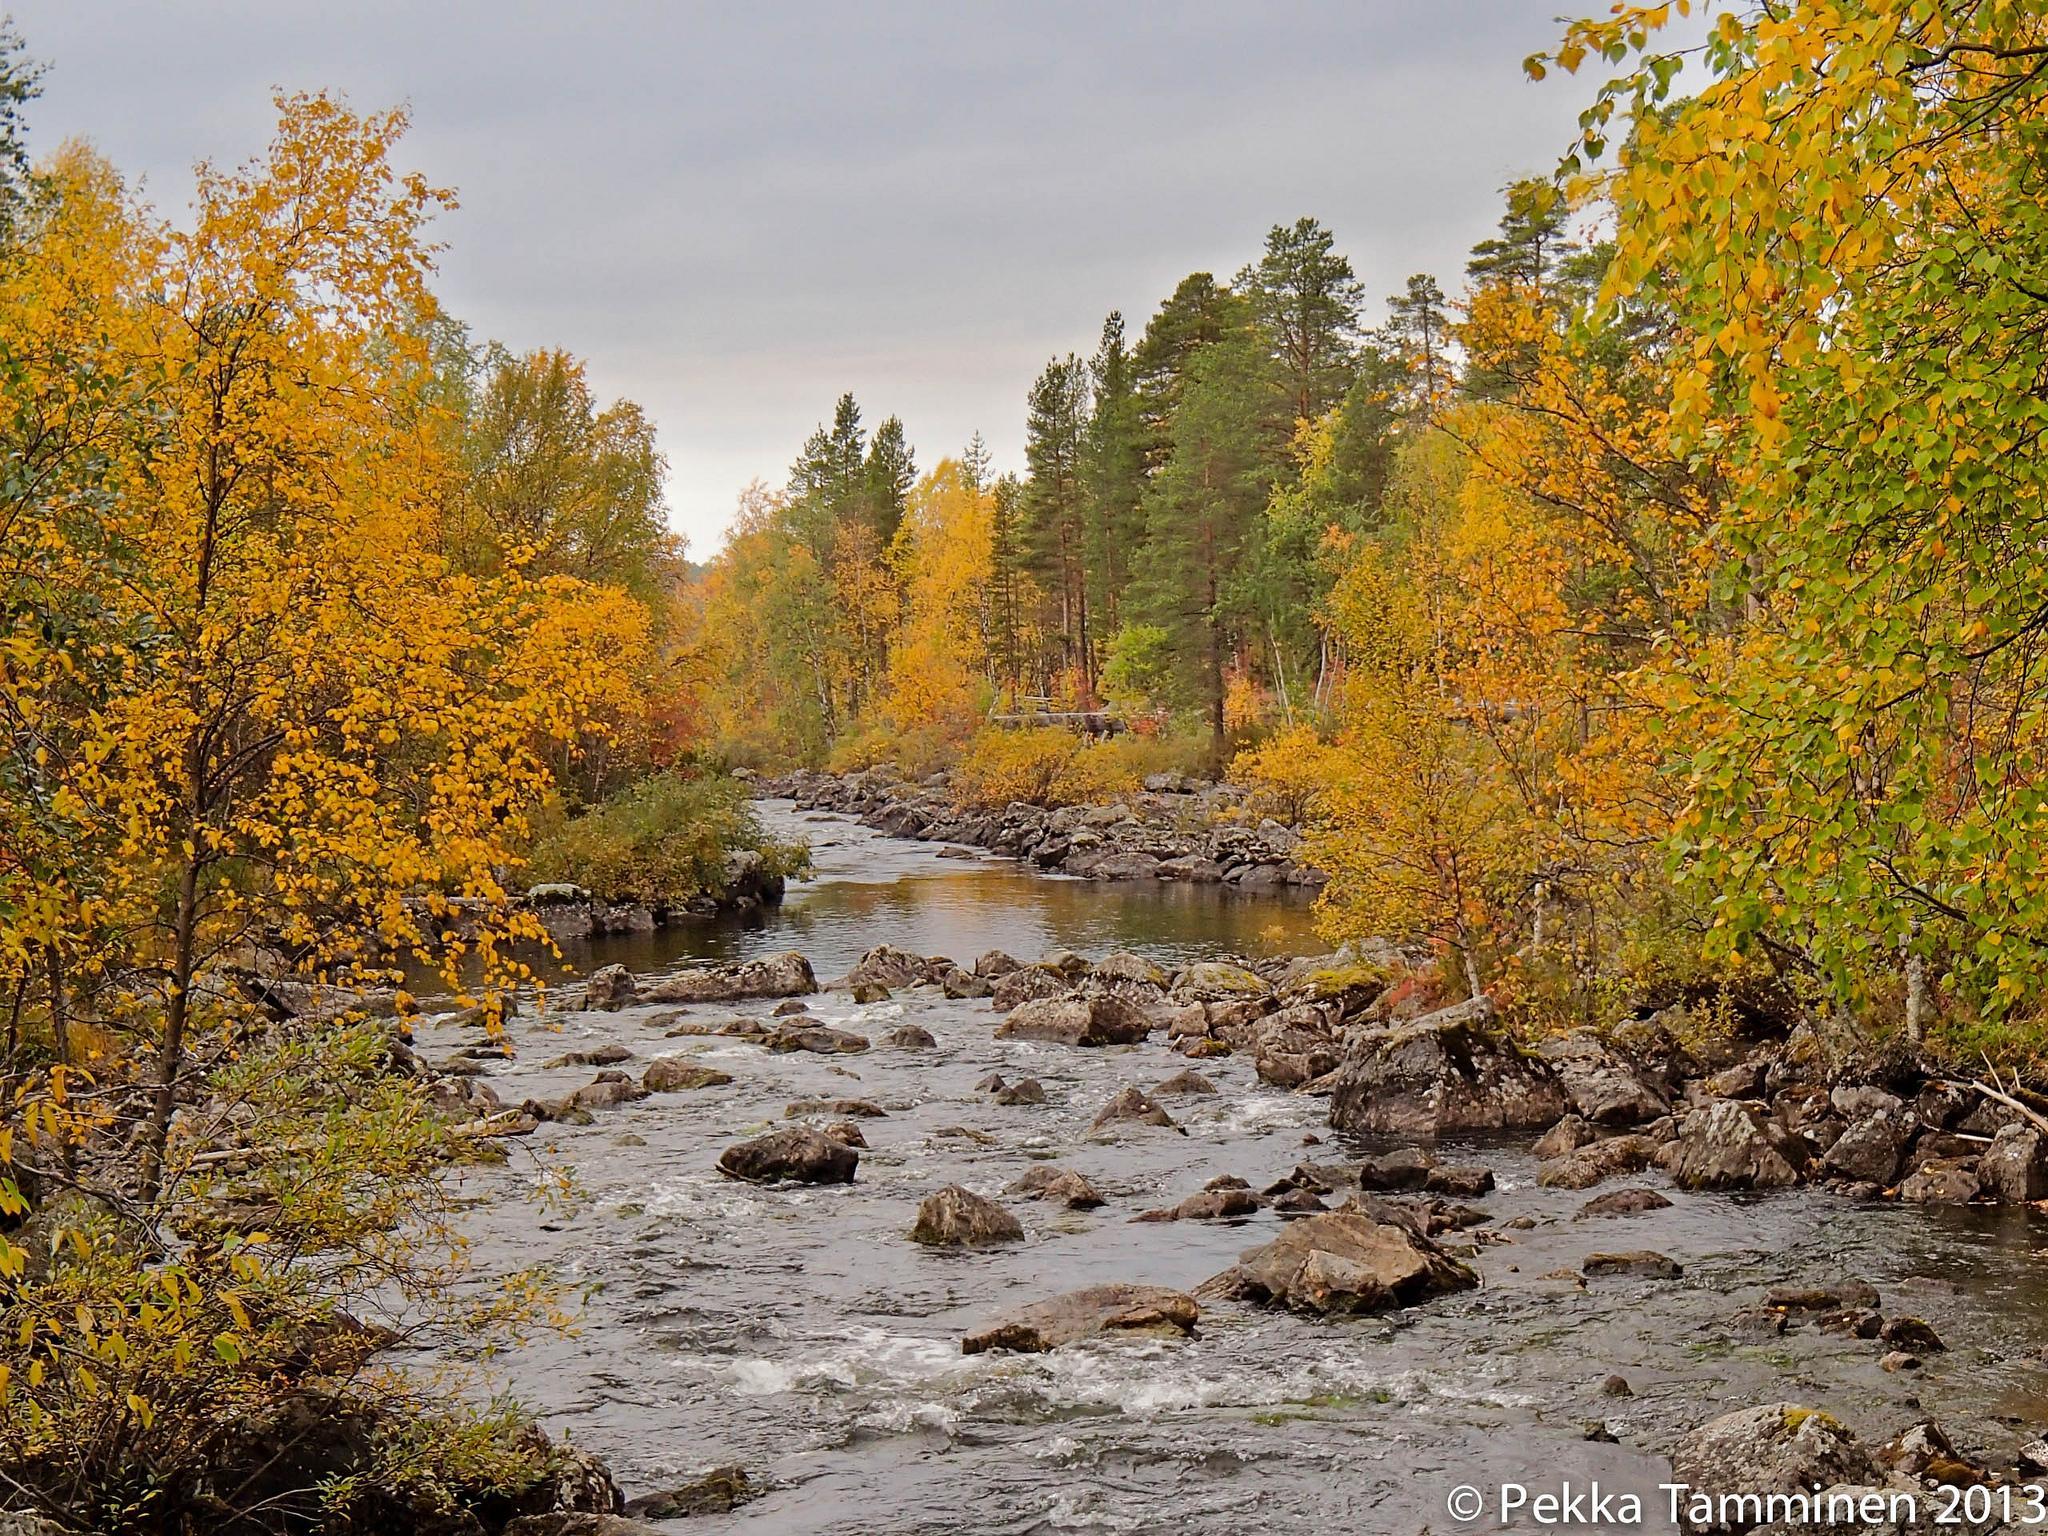 Picture credit: Pekka Tamminen